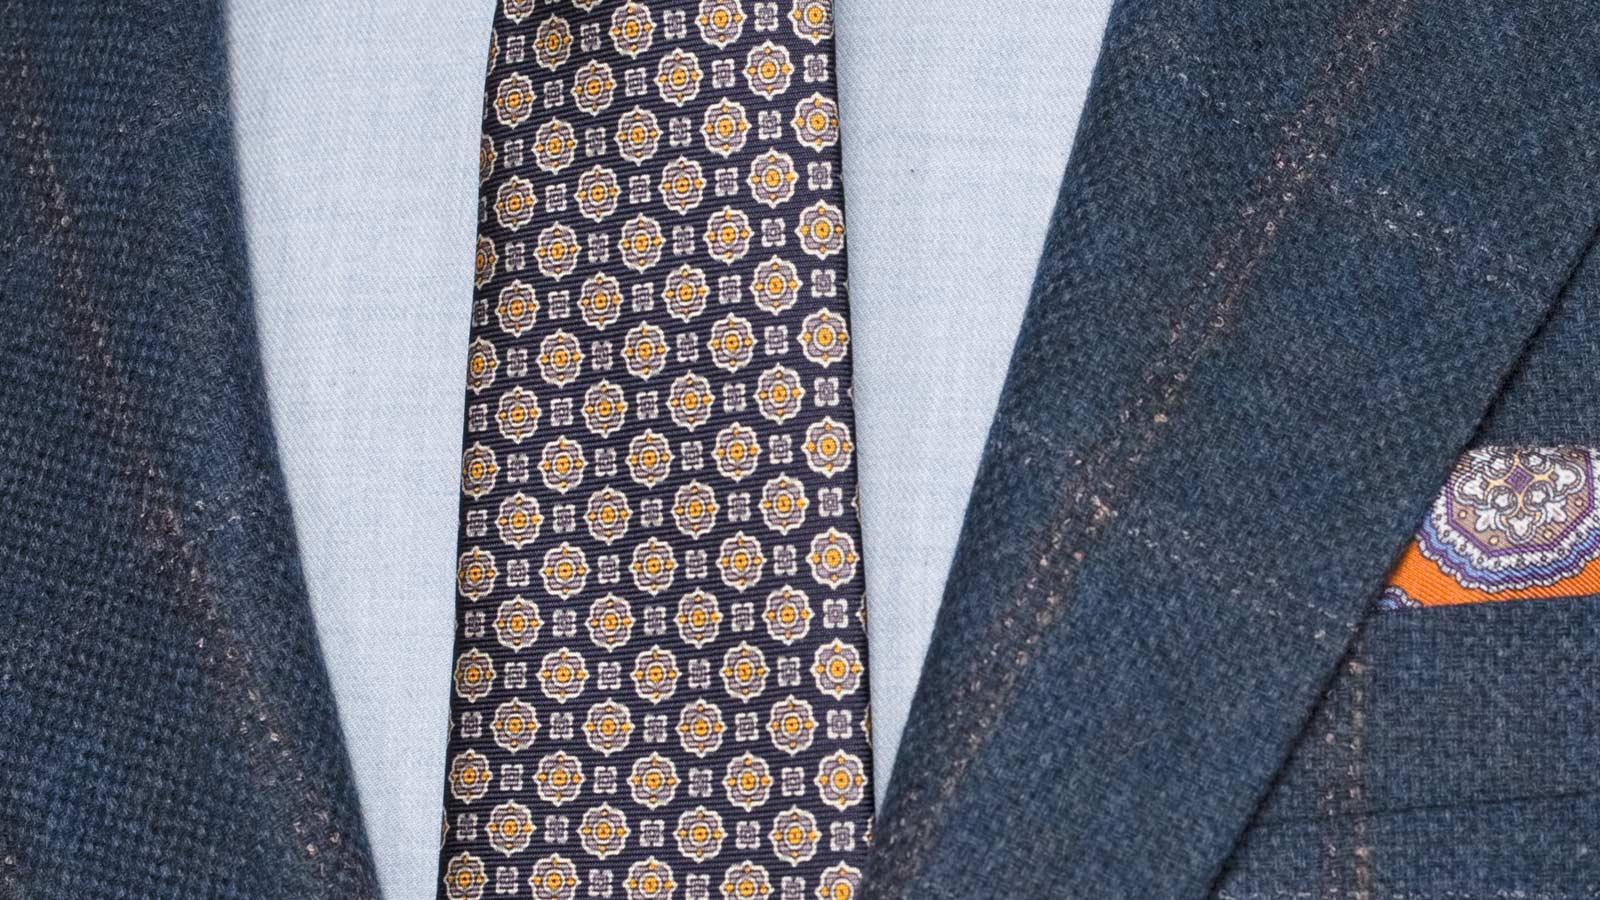 Petrol Blue Check Wool & Cashmere Blazer - slider image 1